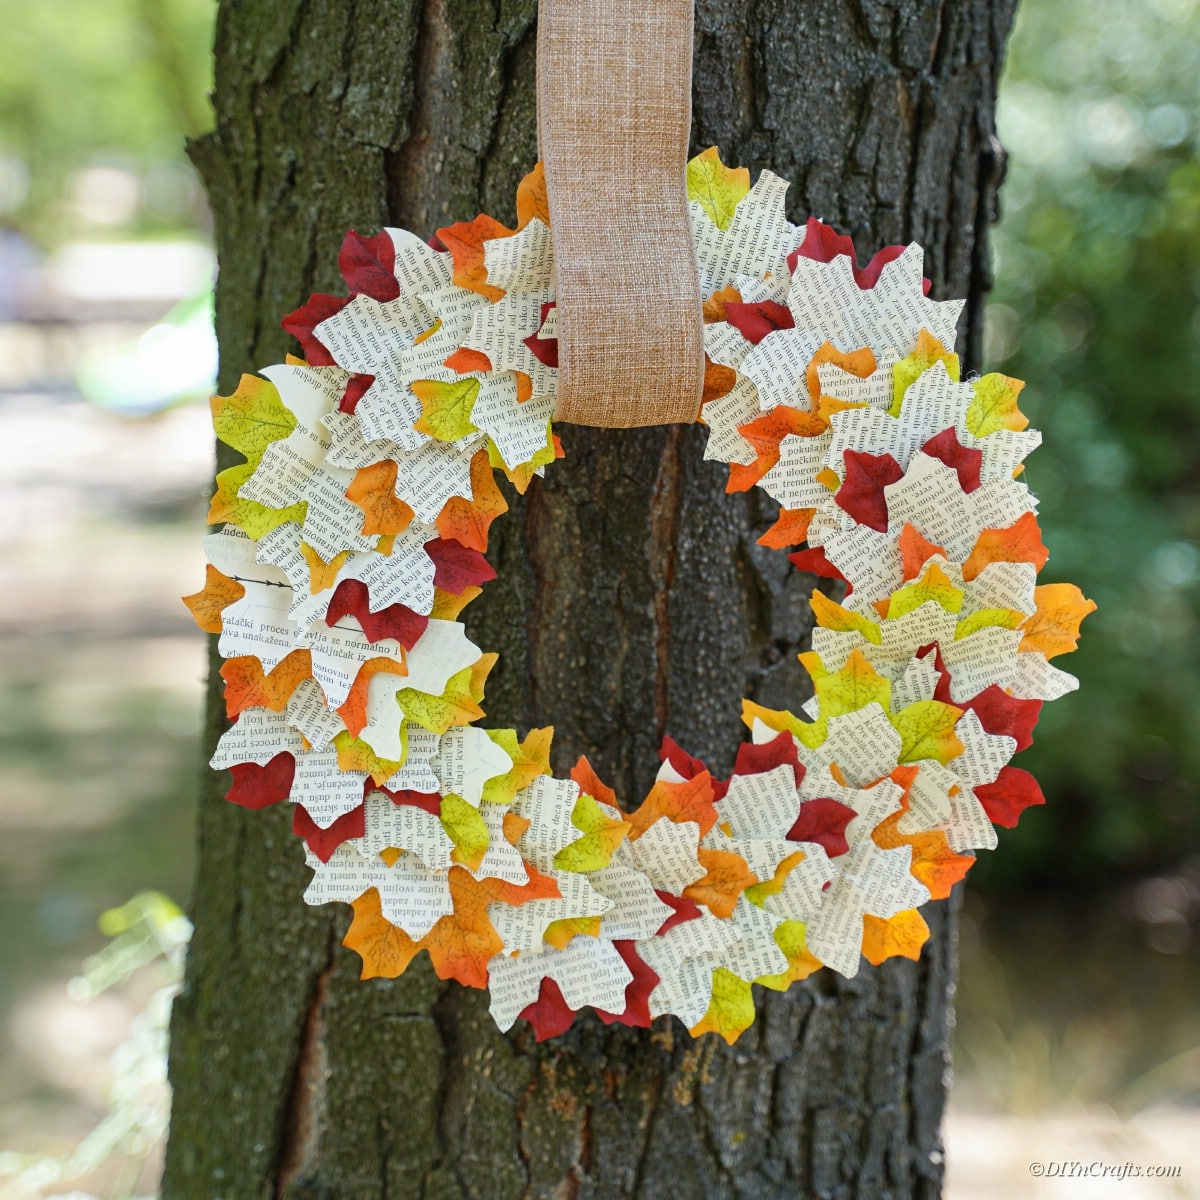 Finished fall leaf wreath hung on a tree outside.